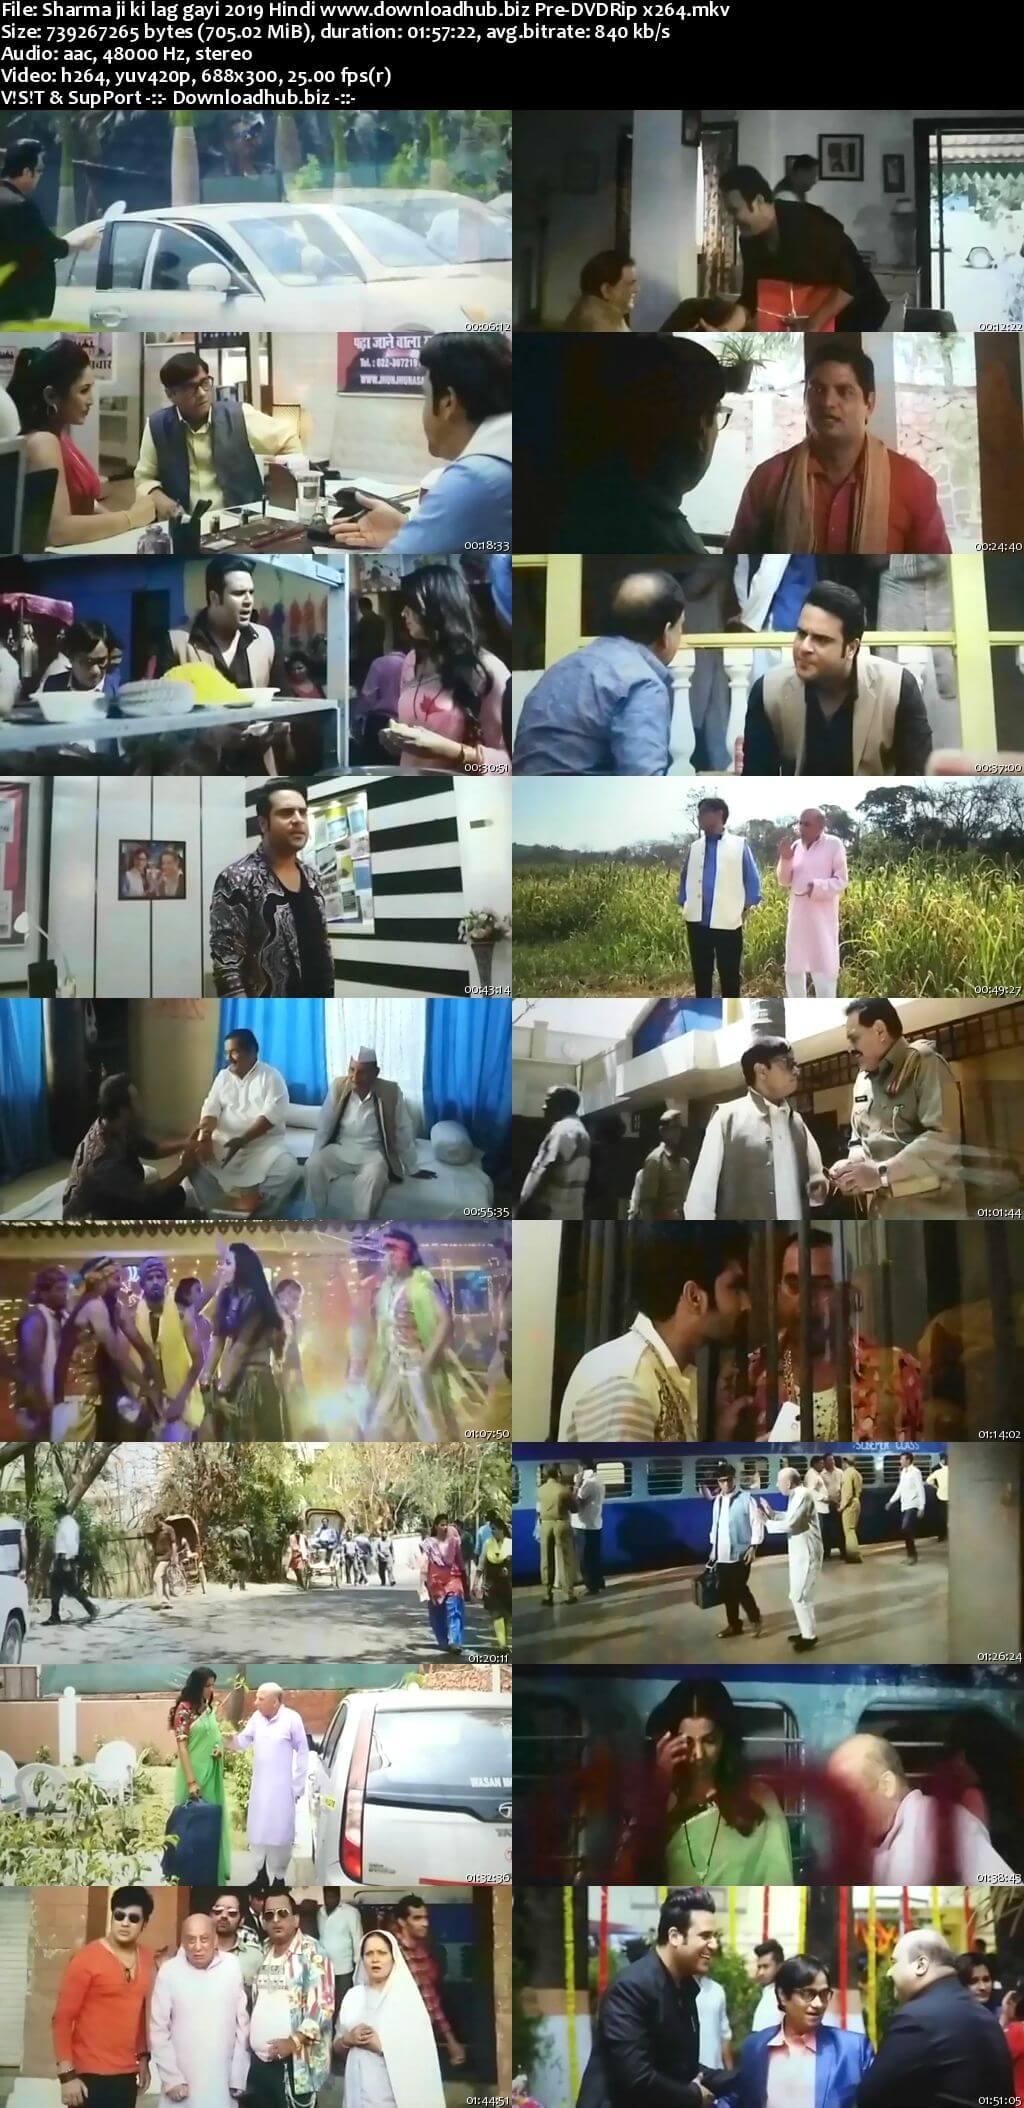 Sharma ji ki lag gayi 2019 Hindi 700MB Pre-DVDRip x264